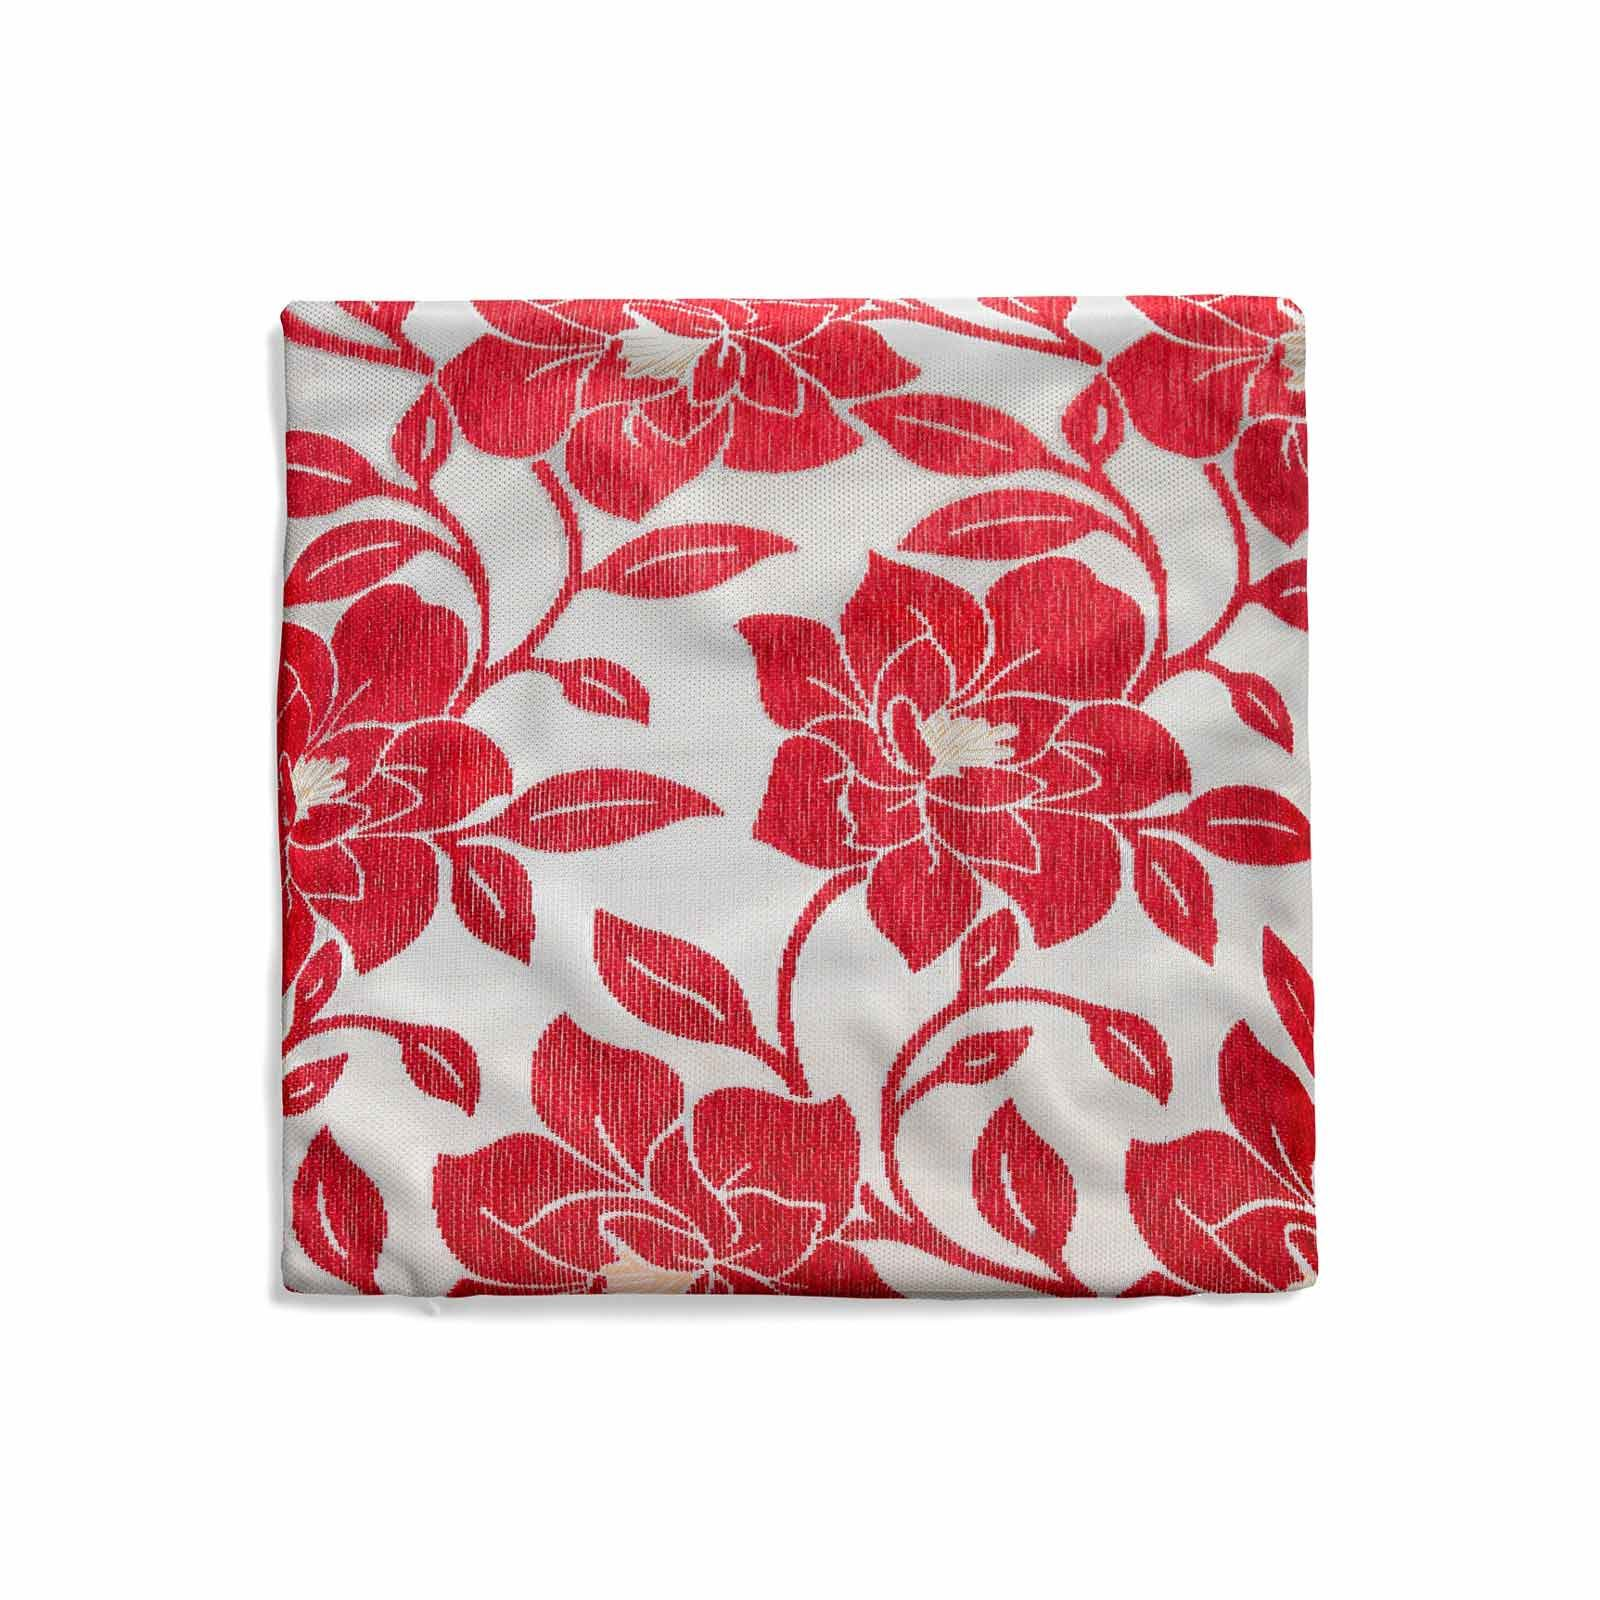 Vino-Tinto-Cushion-Covers-Coleccion-17-034-18-034-43cm-45cm-Cubierta miniatura 54